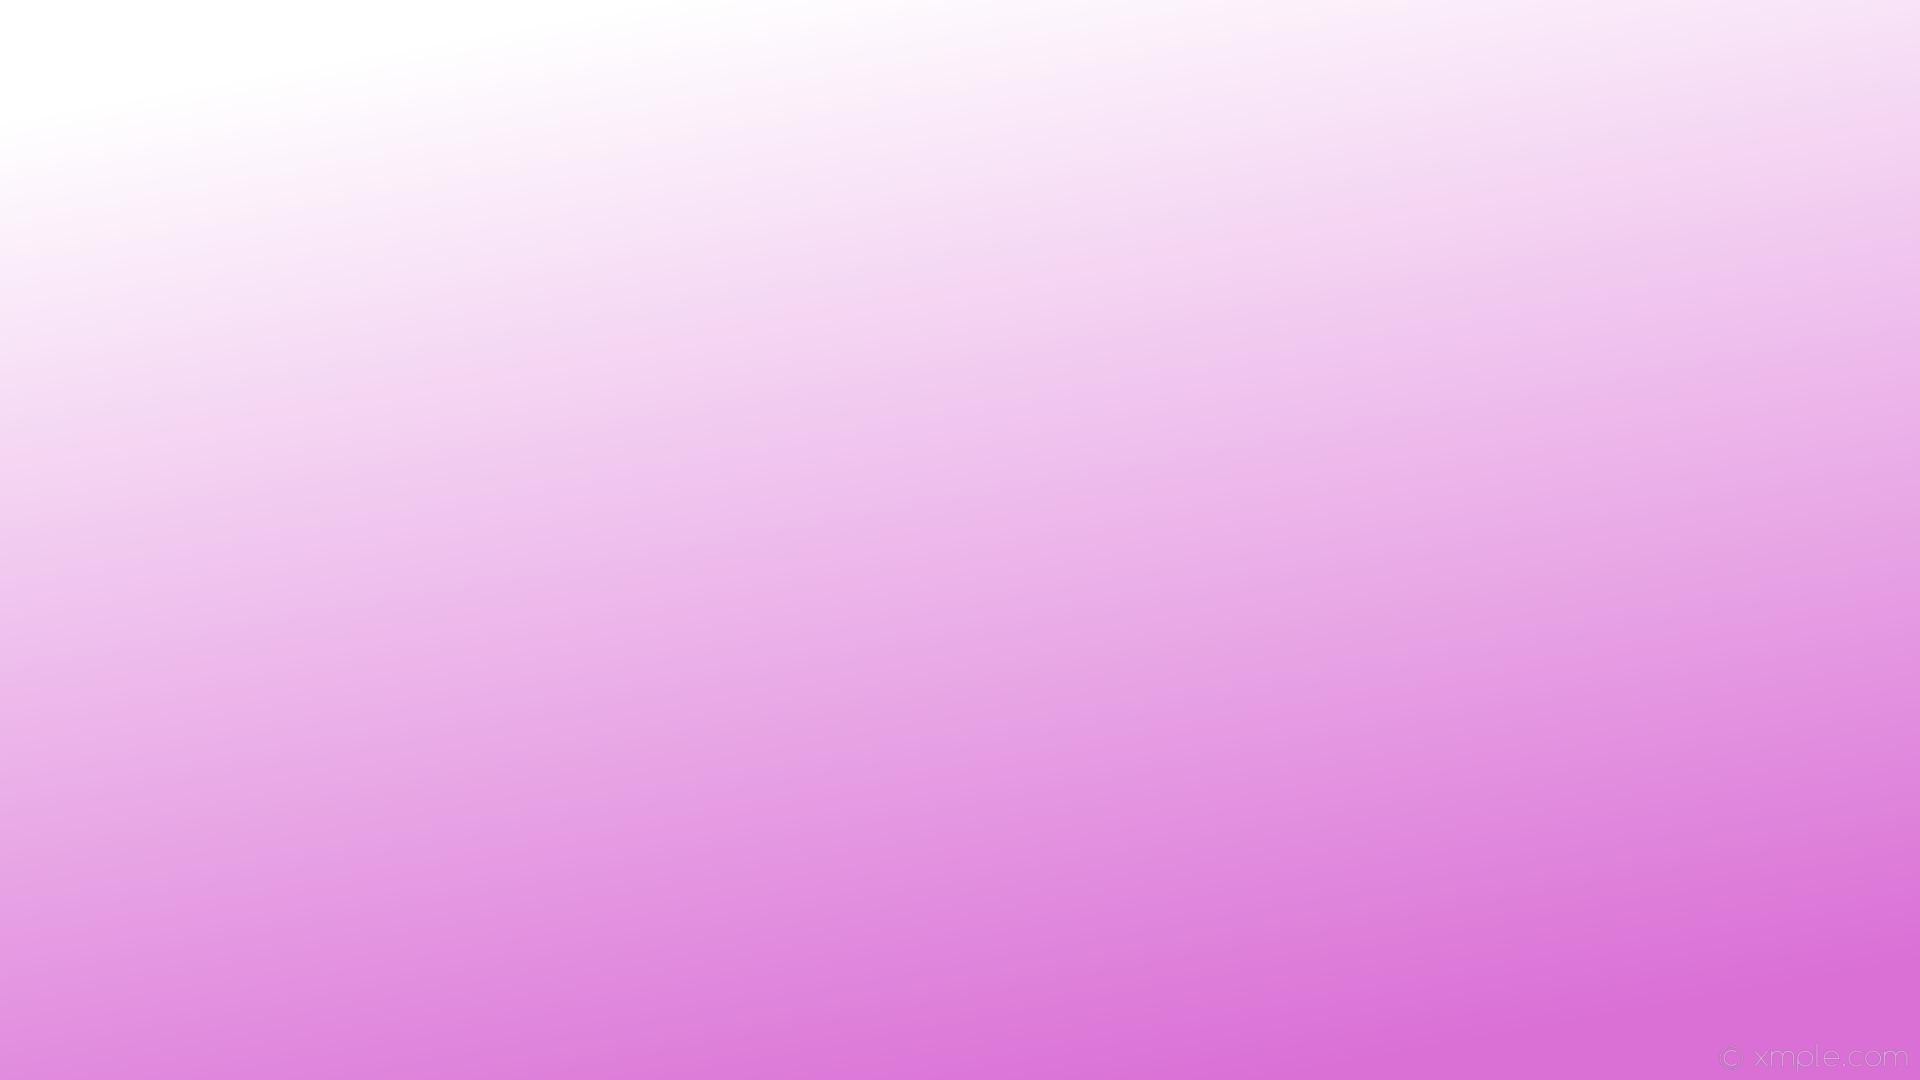 wallpaper gradient linear purple white orchid #da70d6 #ffffff 300°